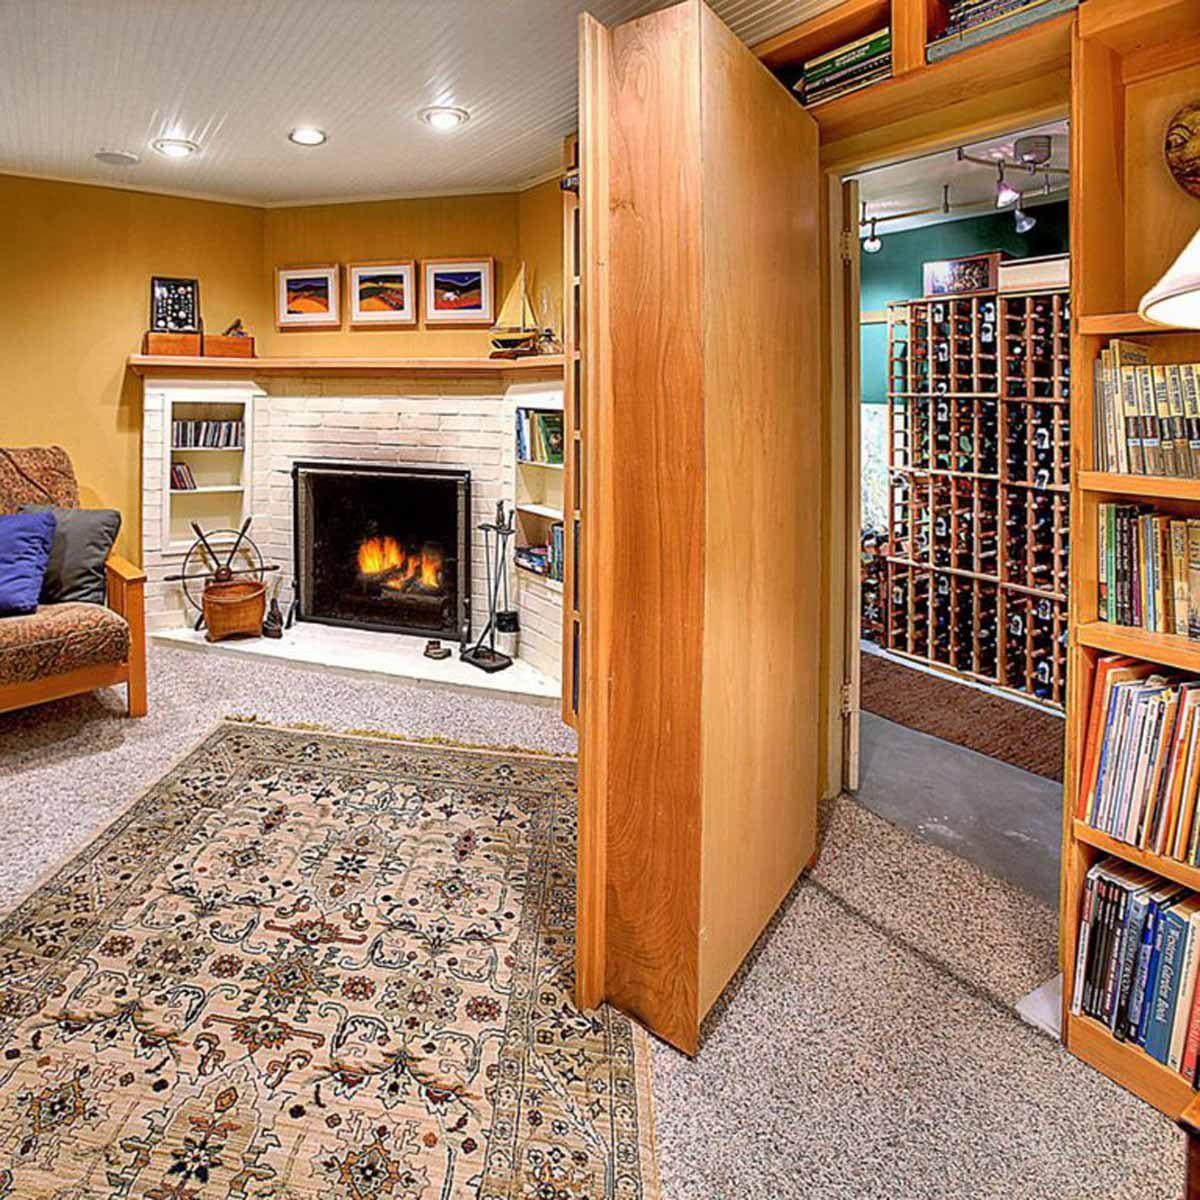 31 Homes Hiding Secrets — The Family Handyman